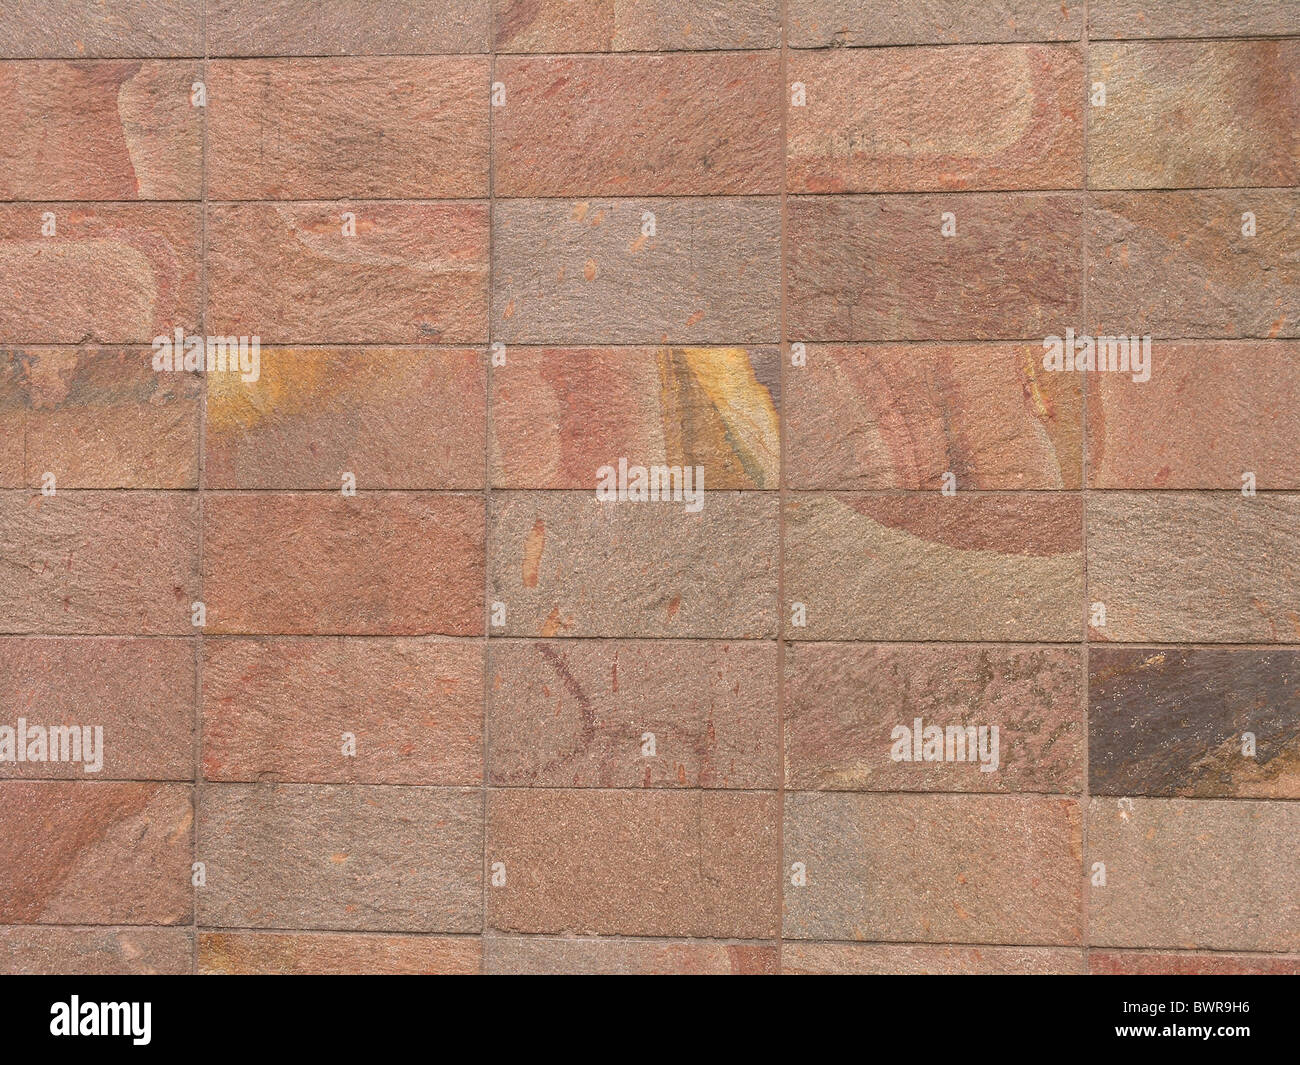 architecture wall facade stones blocks reddish structure - Stock Image